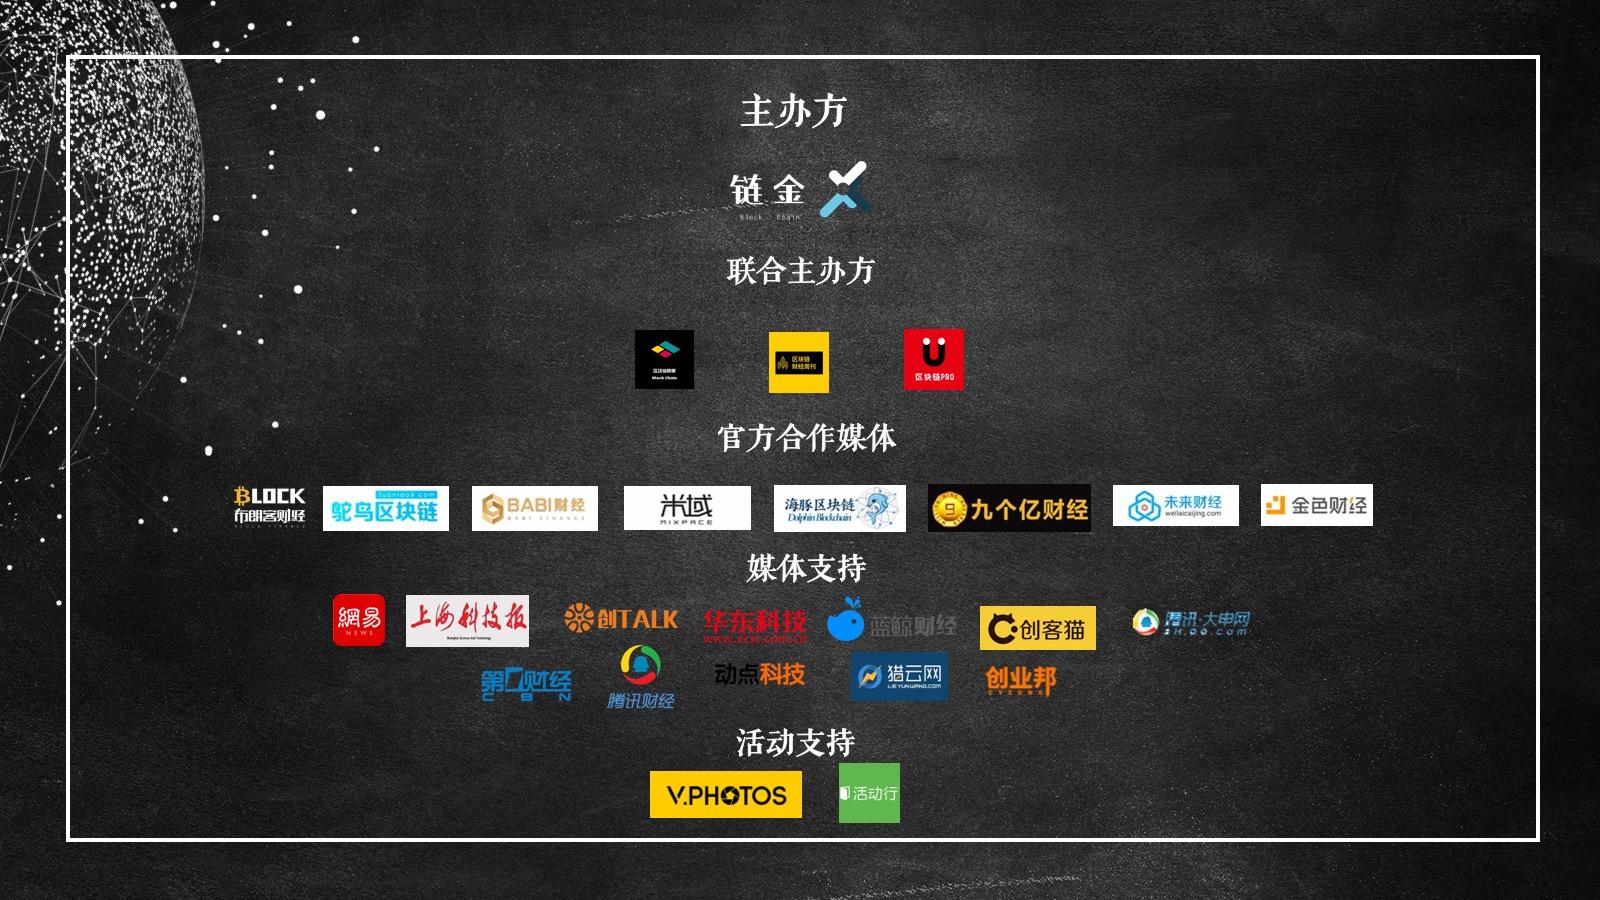 GIES 2018区块链产业技术峰会